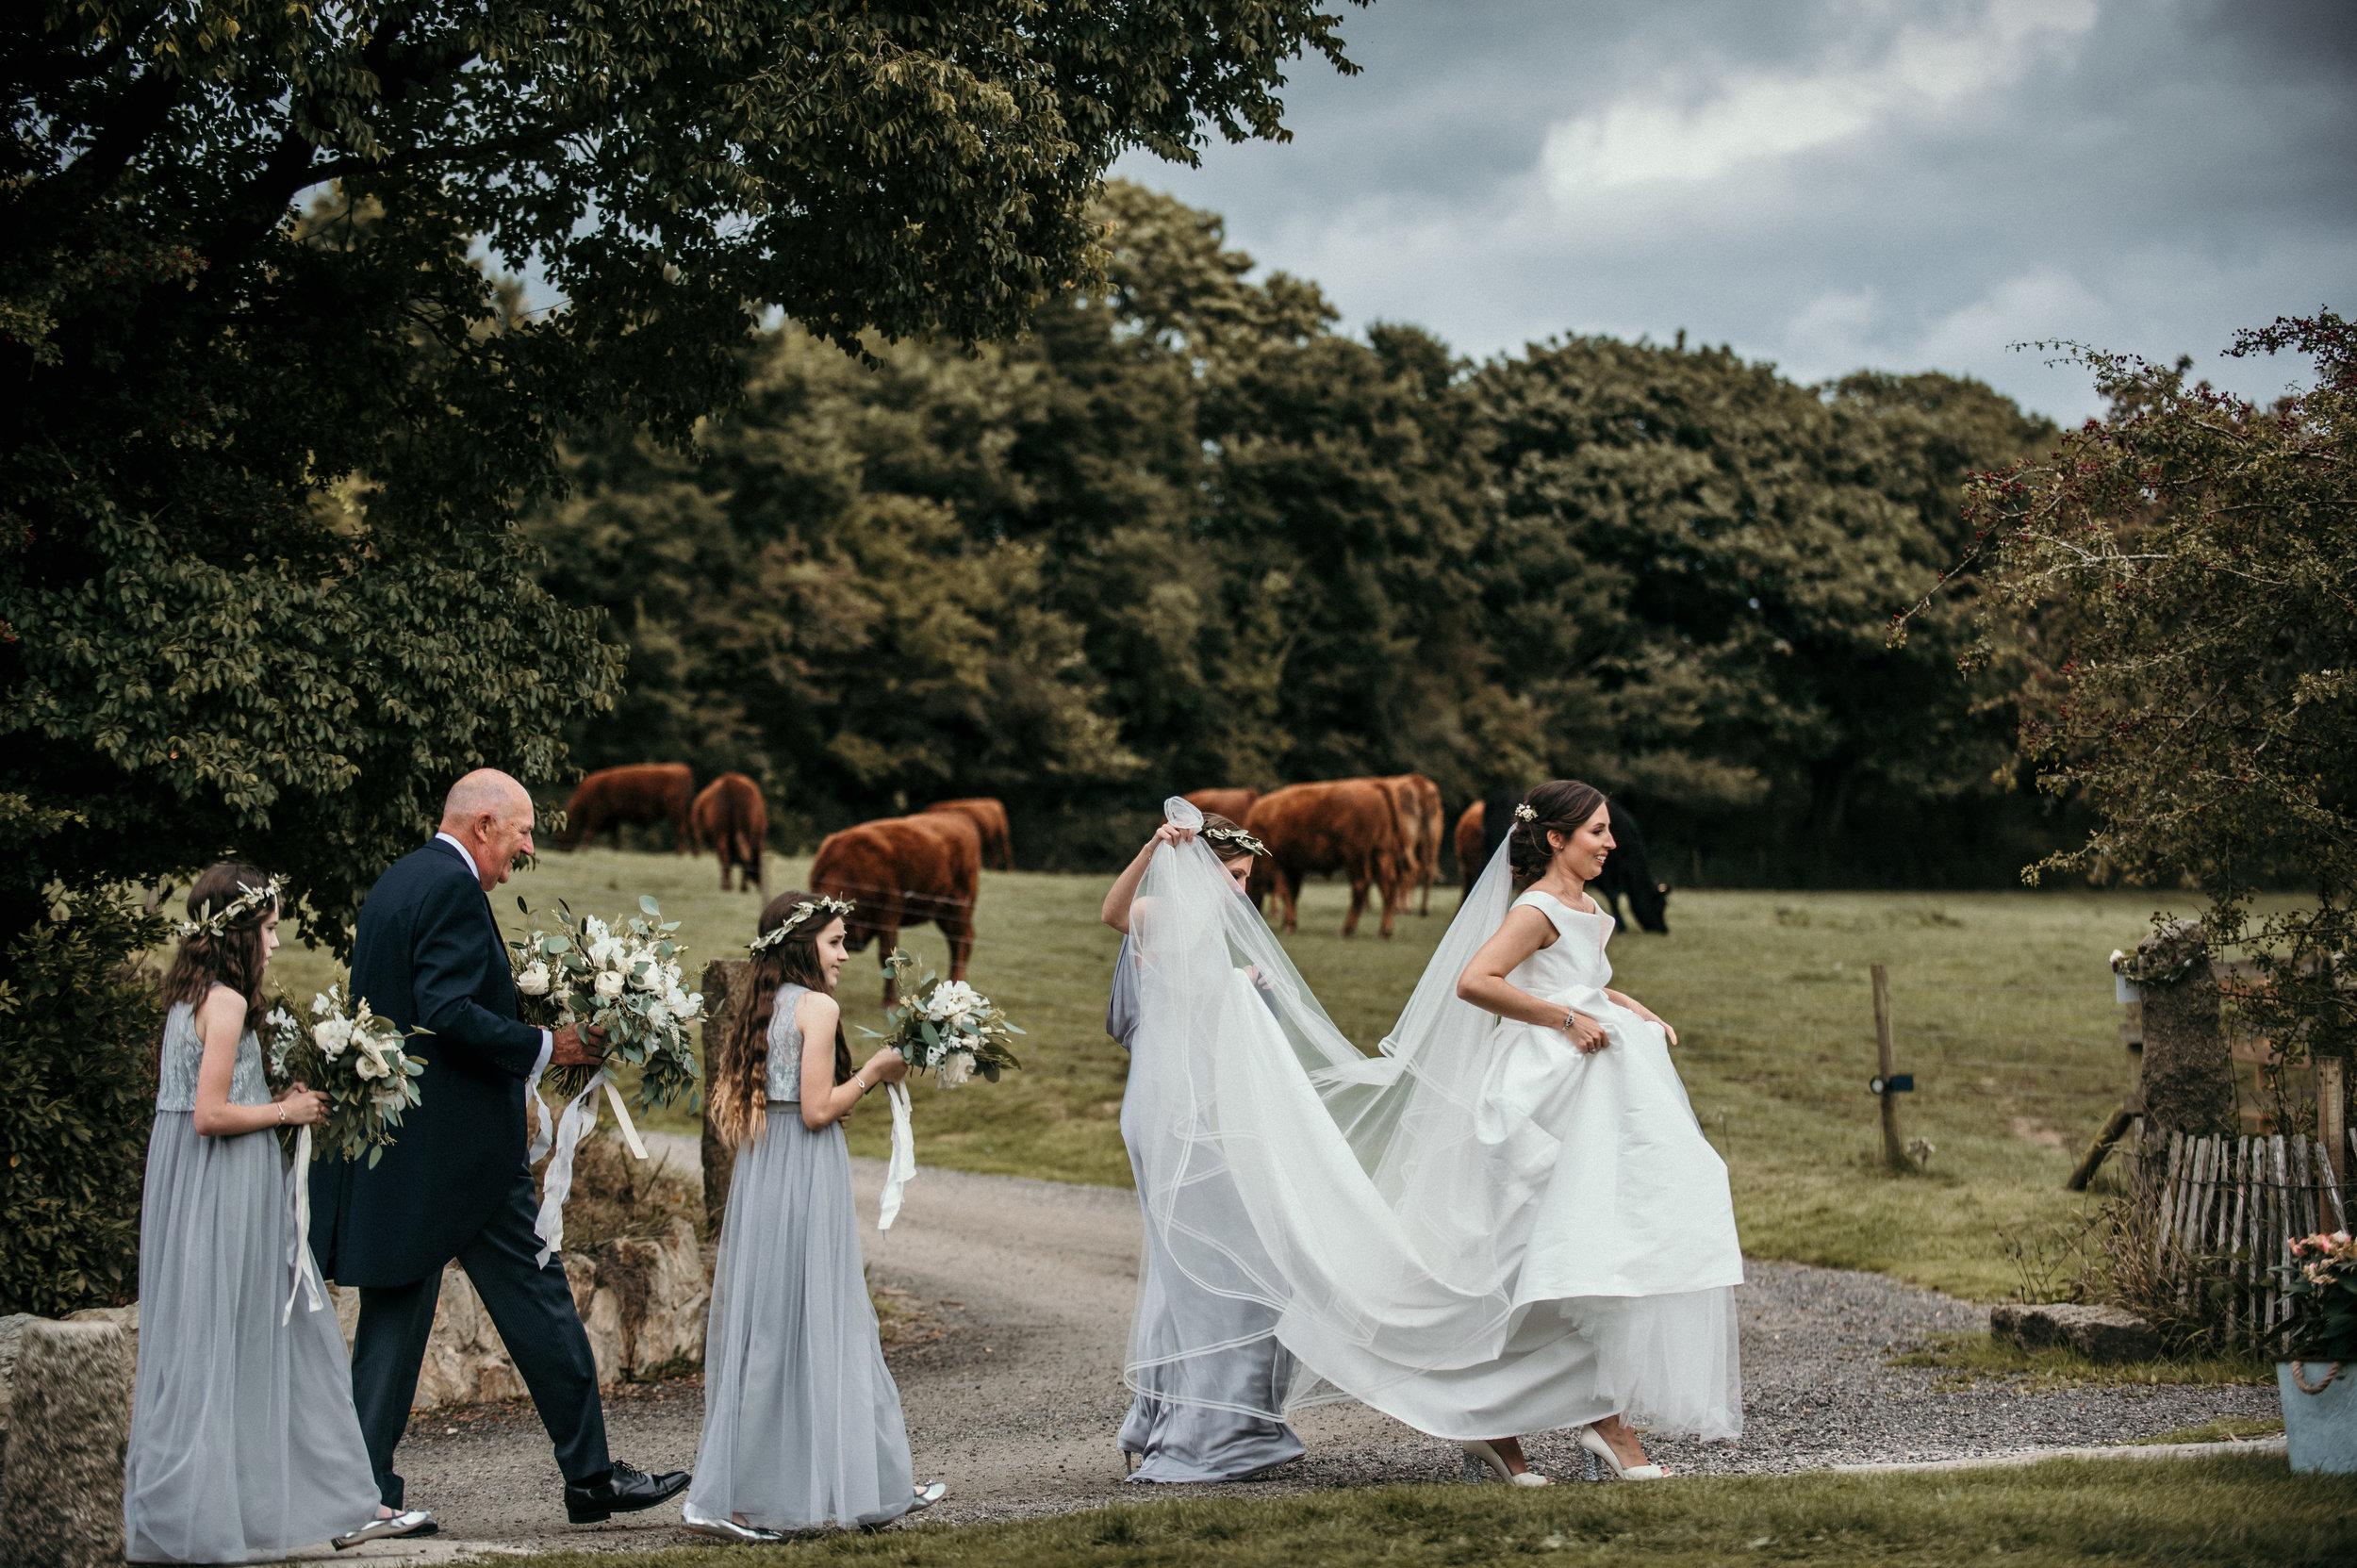 nancarrow-farm-wedding-photographer-cornwall-6.jpg